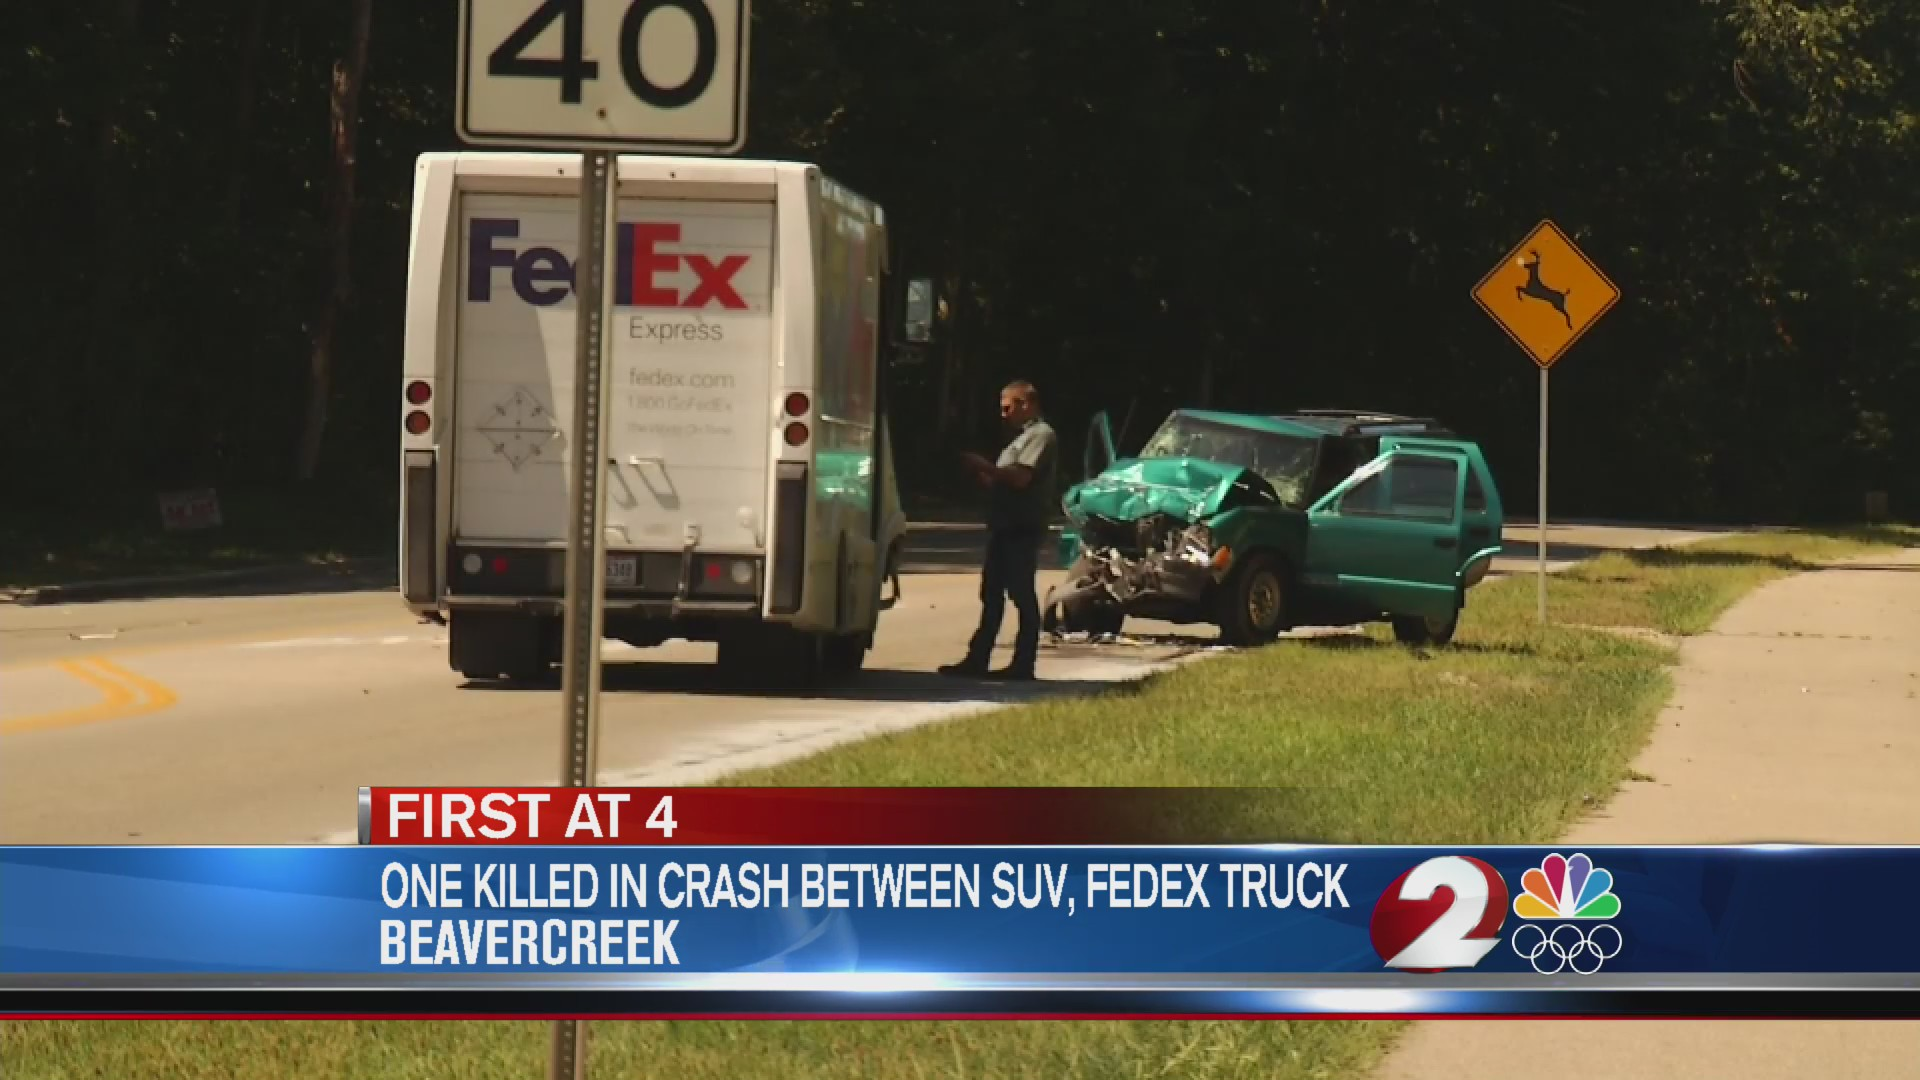 Officials identify passenger killed in crash between SUV